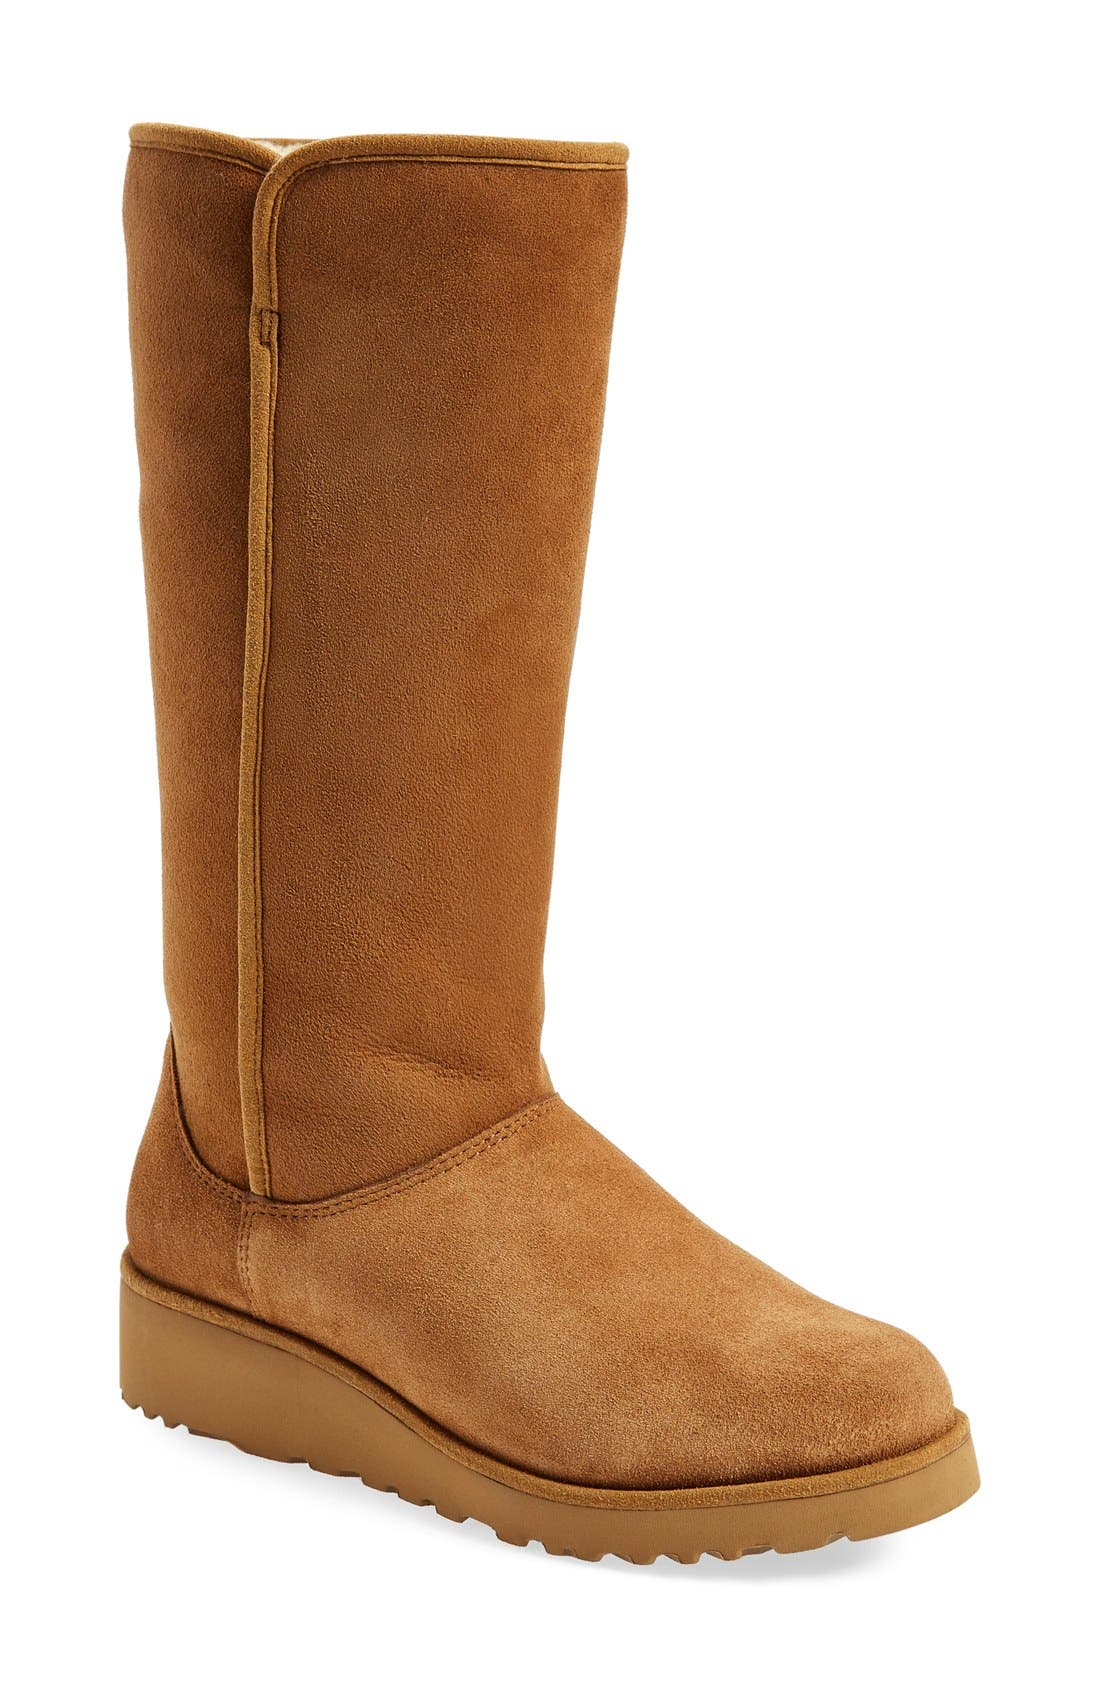 Main Image - UGG® Kara - Classic Slim™ Water Resistant Tall Boot (Women)